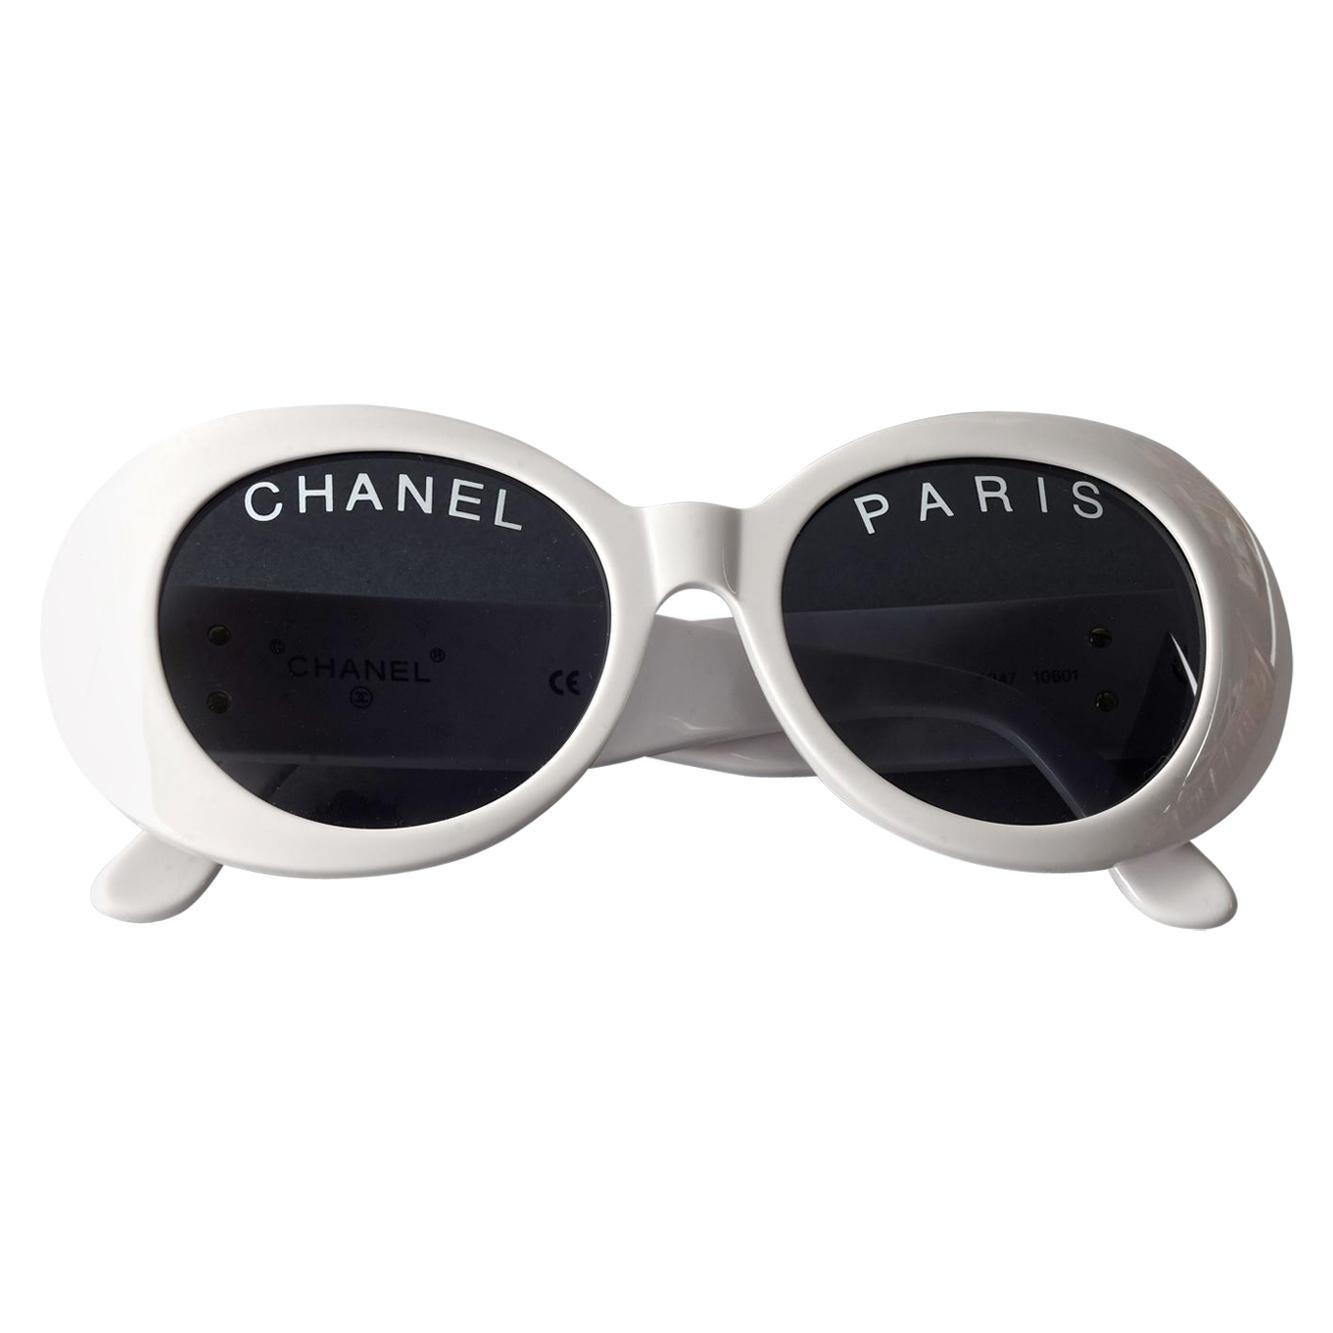 Vintage 1993 Iconic CHANEL PARIS Spelled White Sunglasses